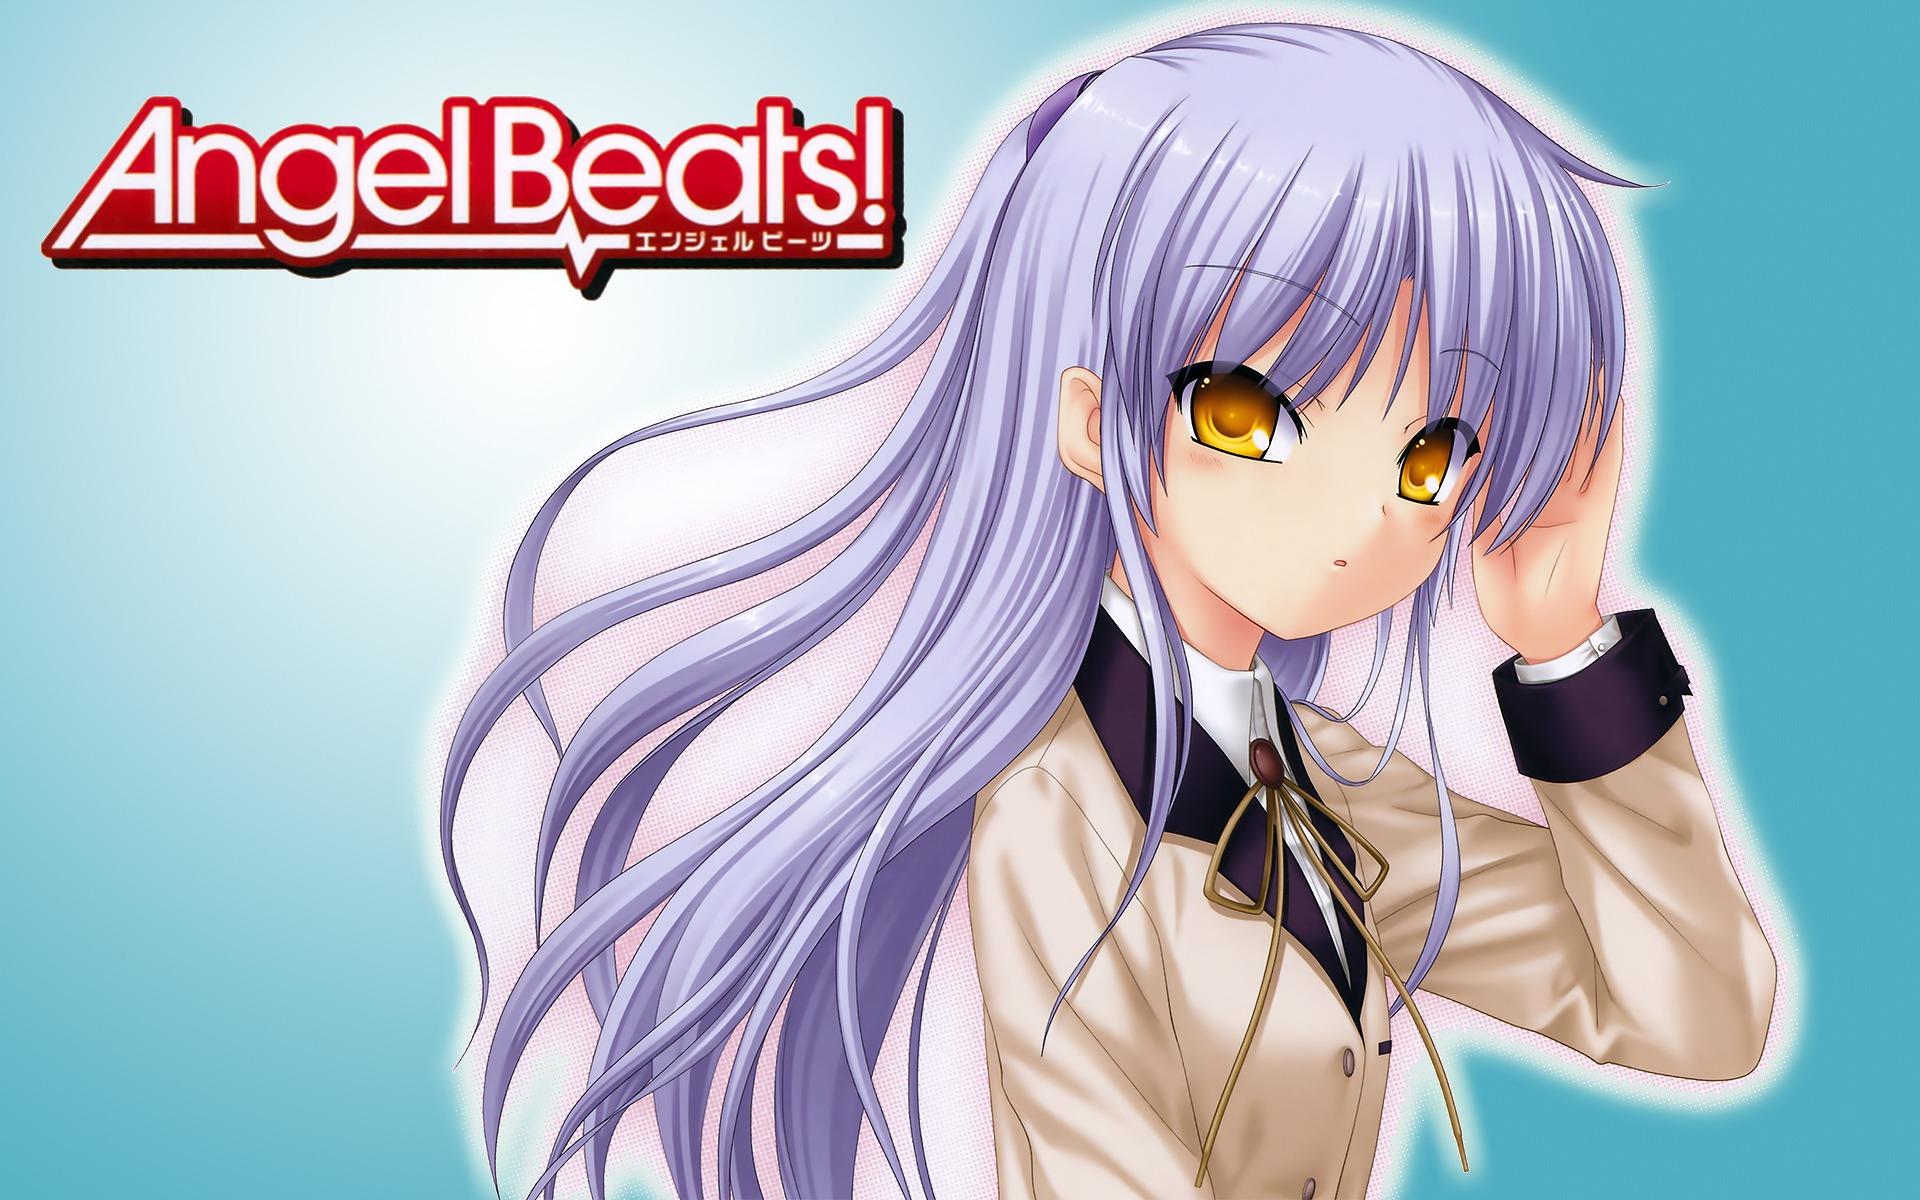 angel_beats!-15-.jpg